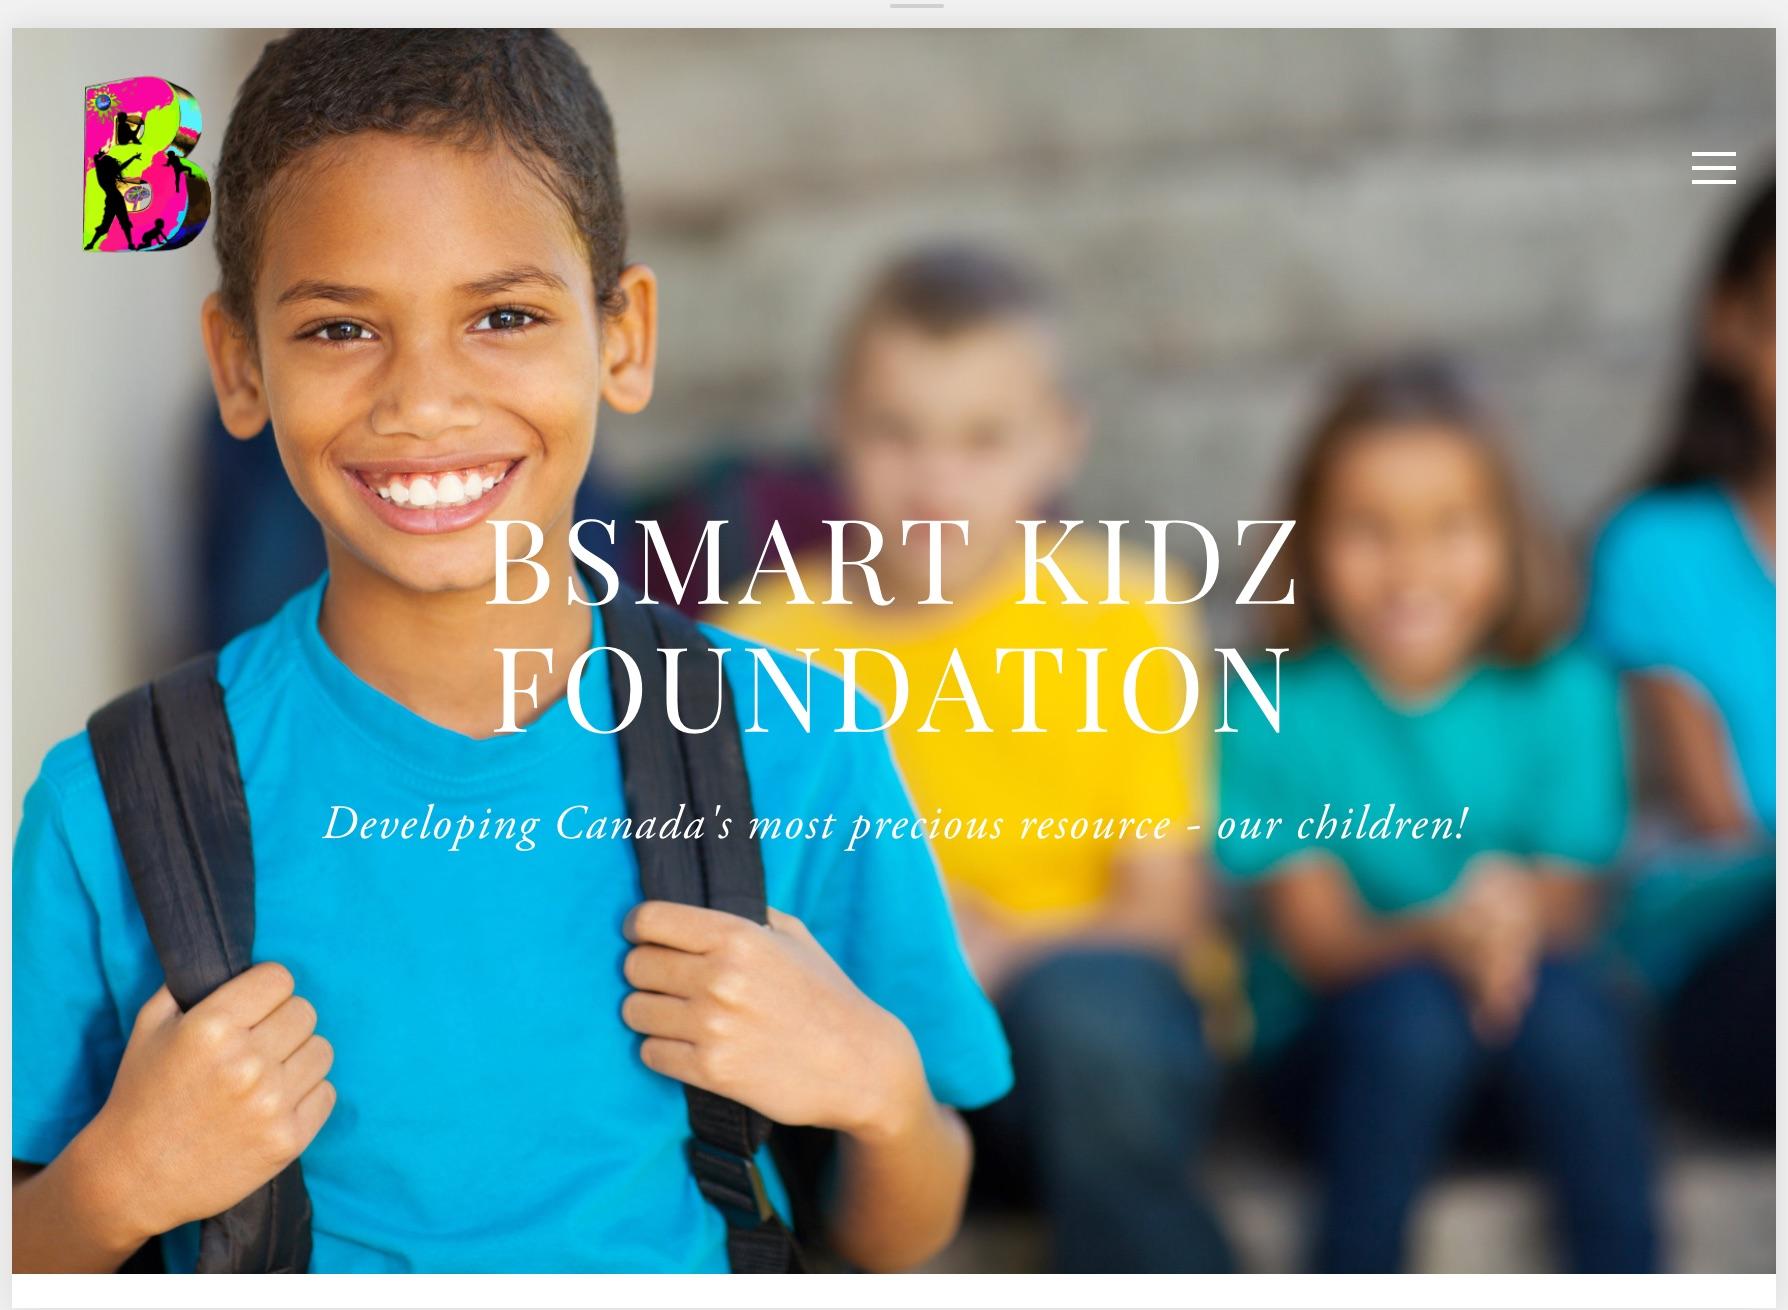 BSMART_Kidz_Foundation_coverpage.jpg